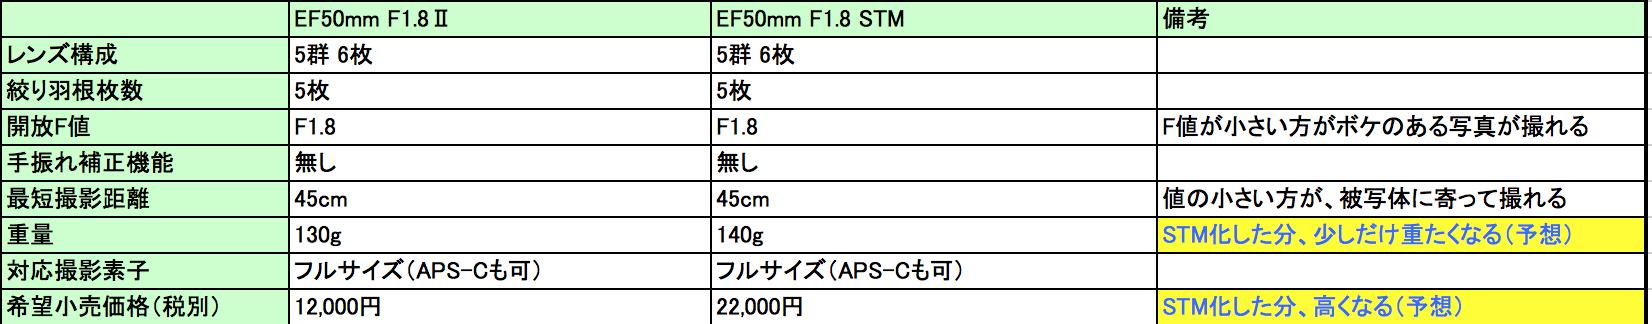 EF50mmF1.8Ⅱ vs EF50mmF1.8 STMスペック比較表(予想)